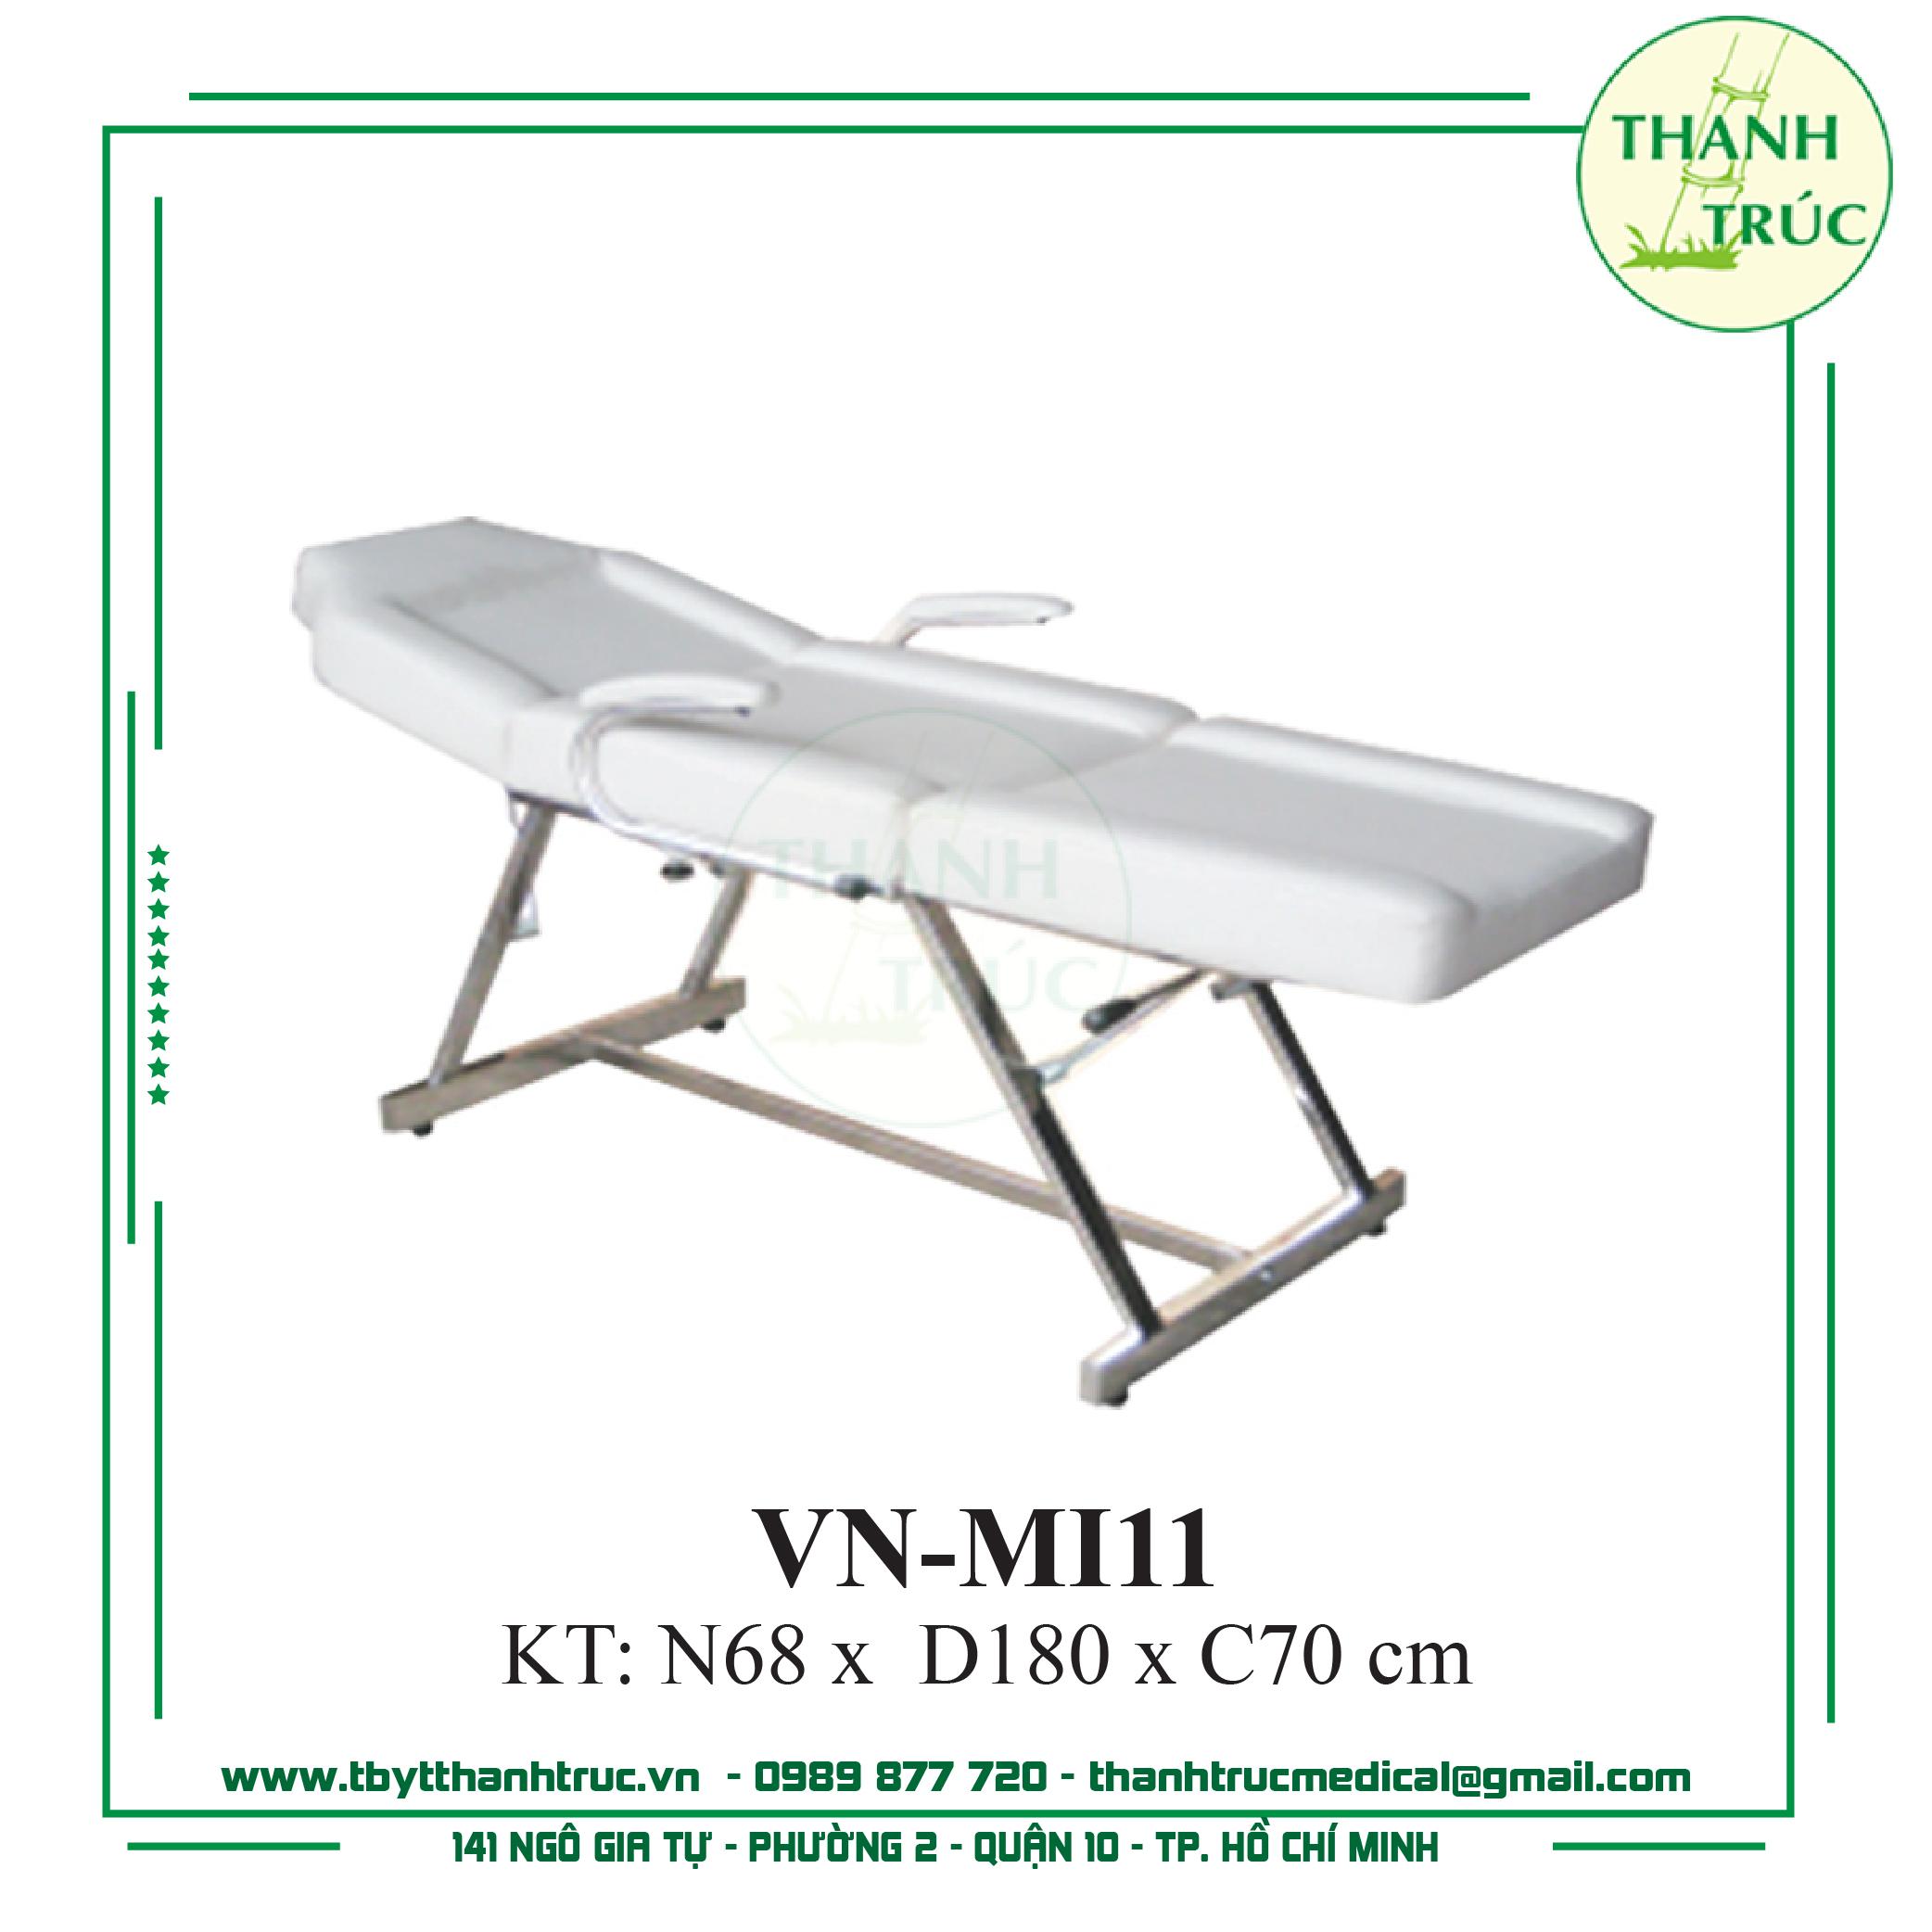 GIƯỜNG MASSAGE INOX VN-MI11